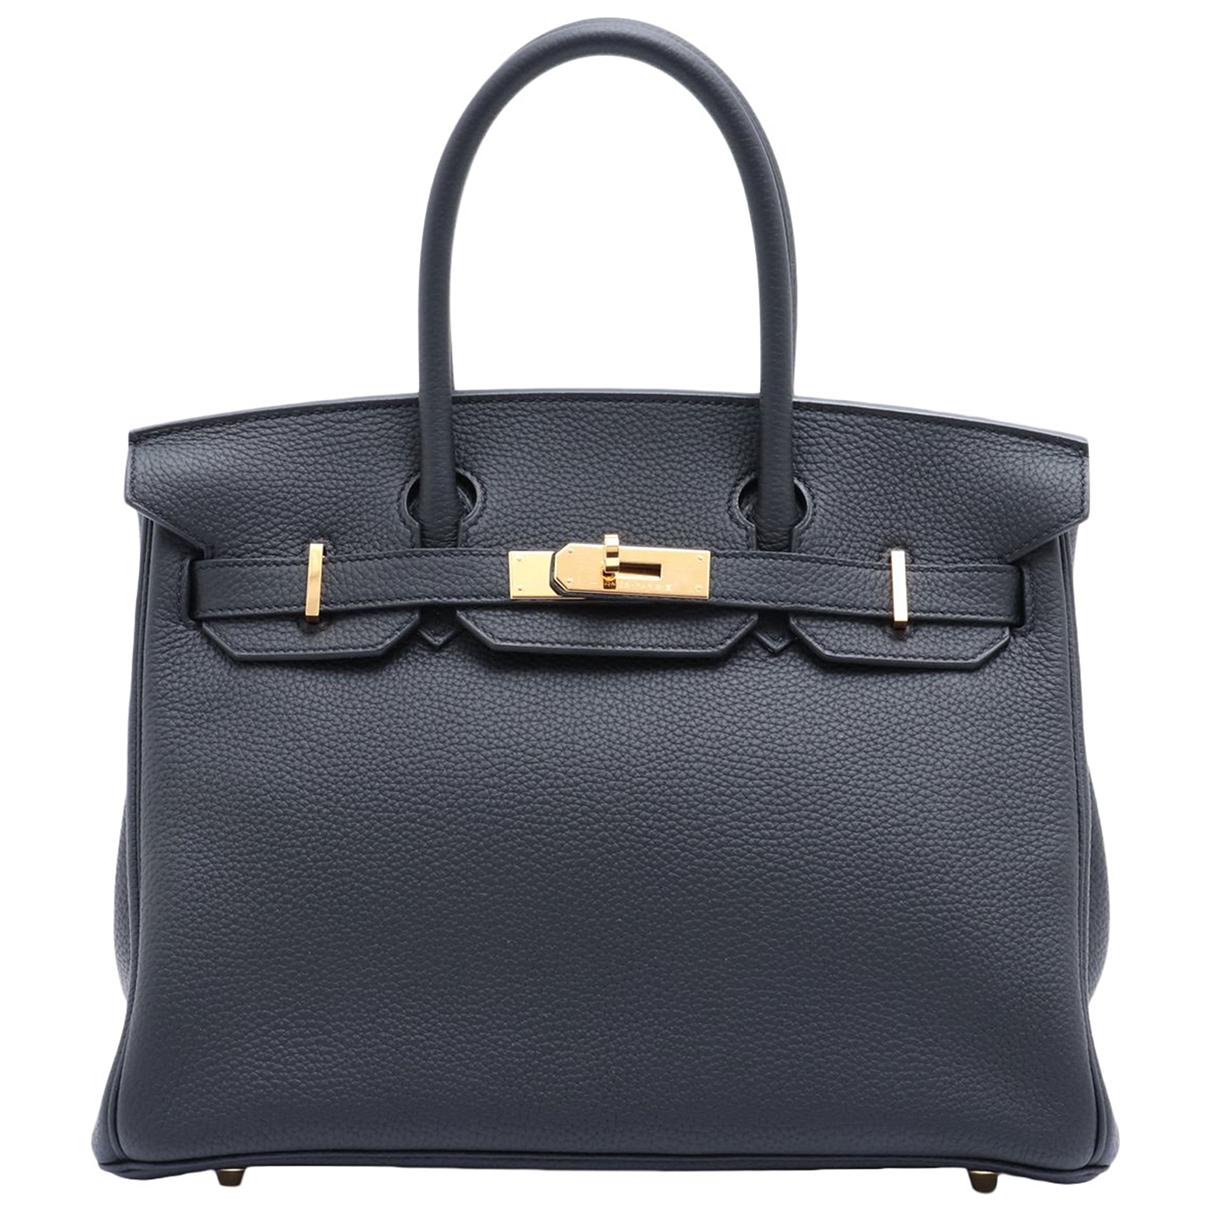 Hermès Birkin 30 Black Leather handbag for Women N